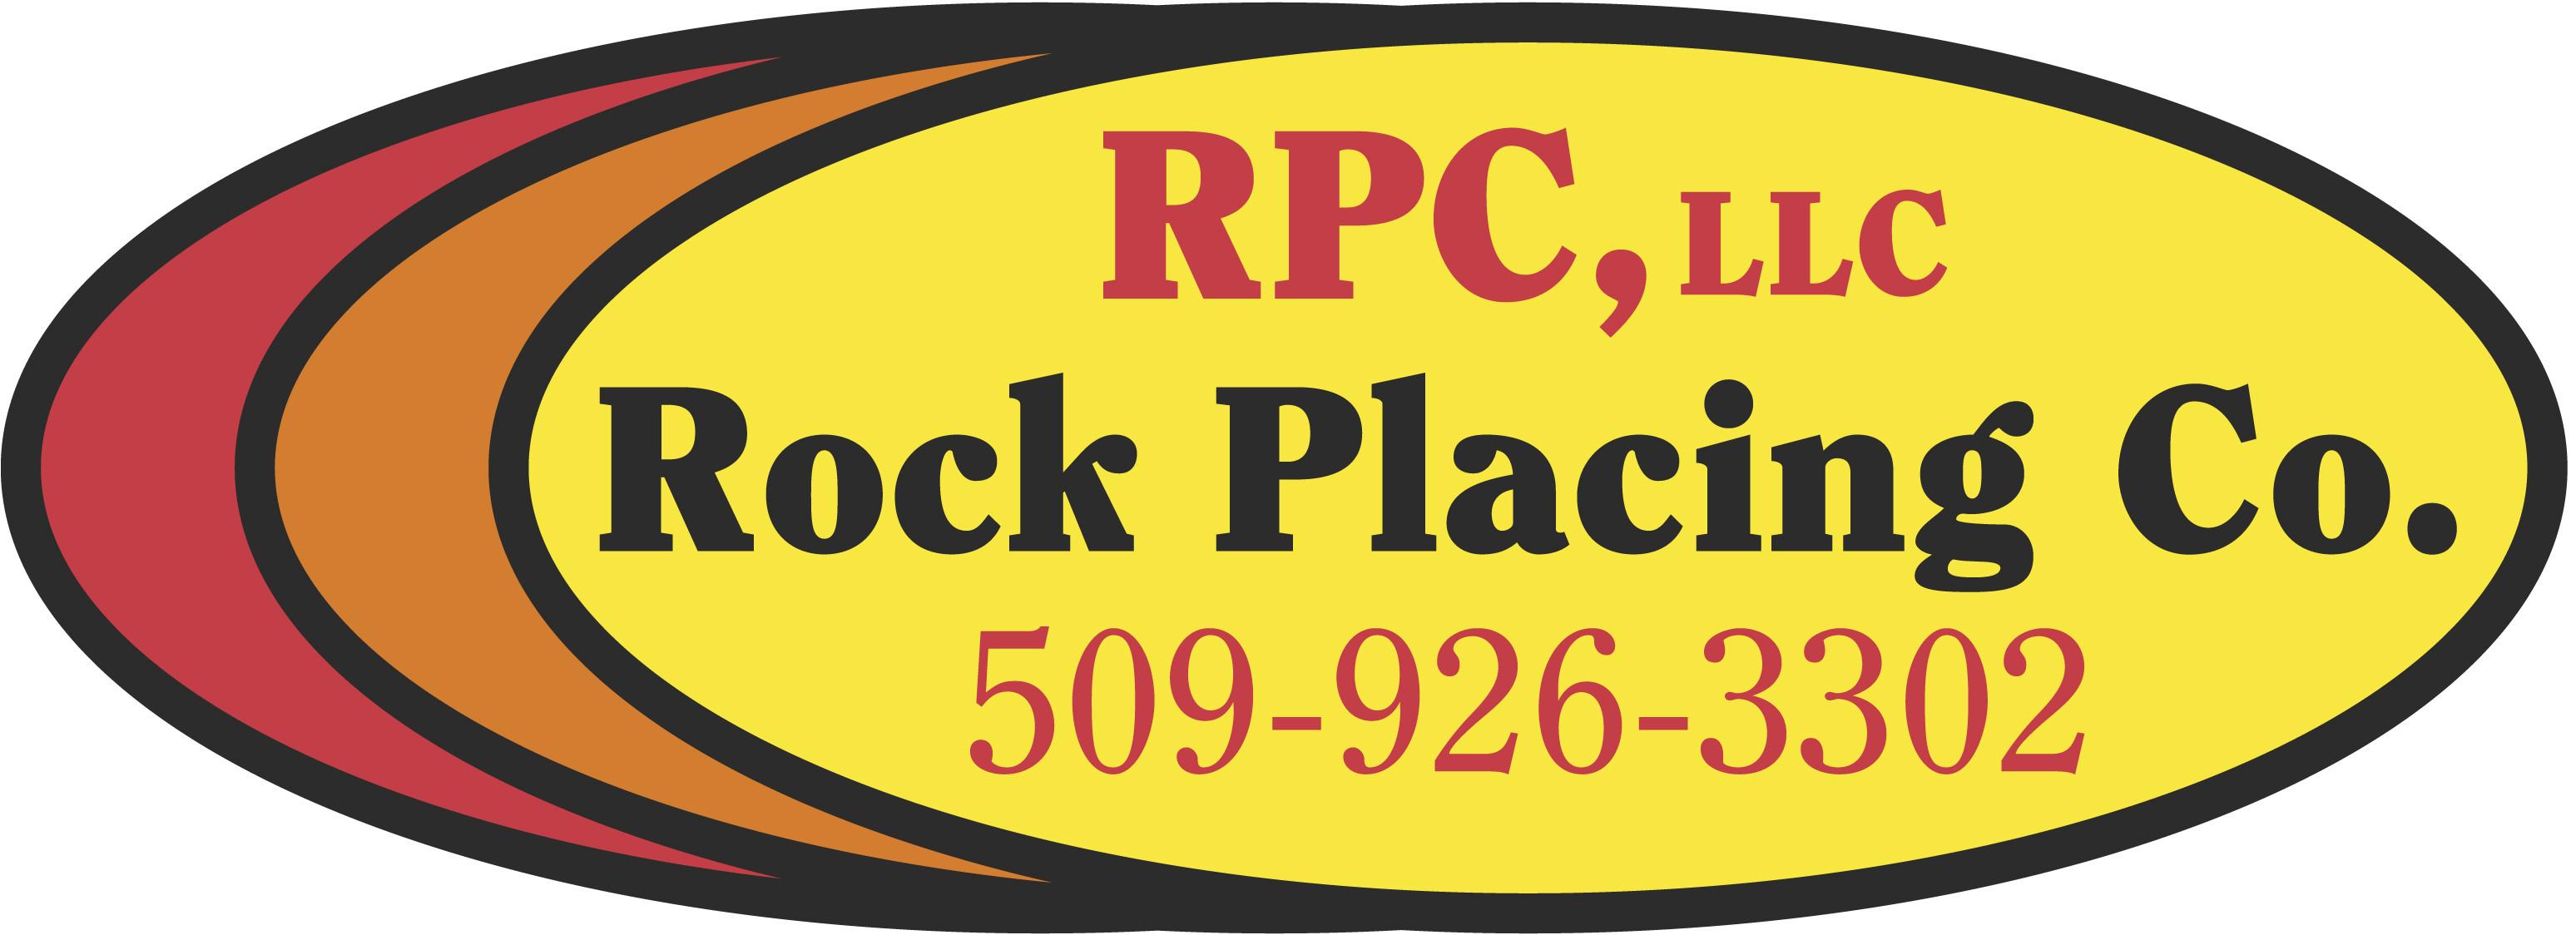 rock placing